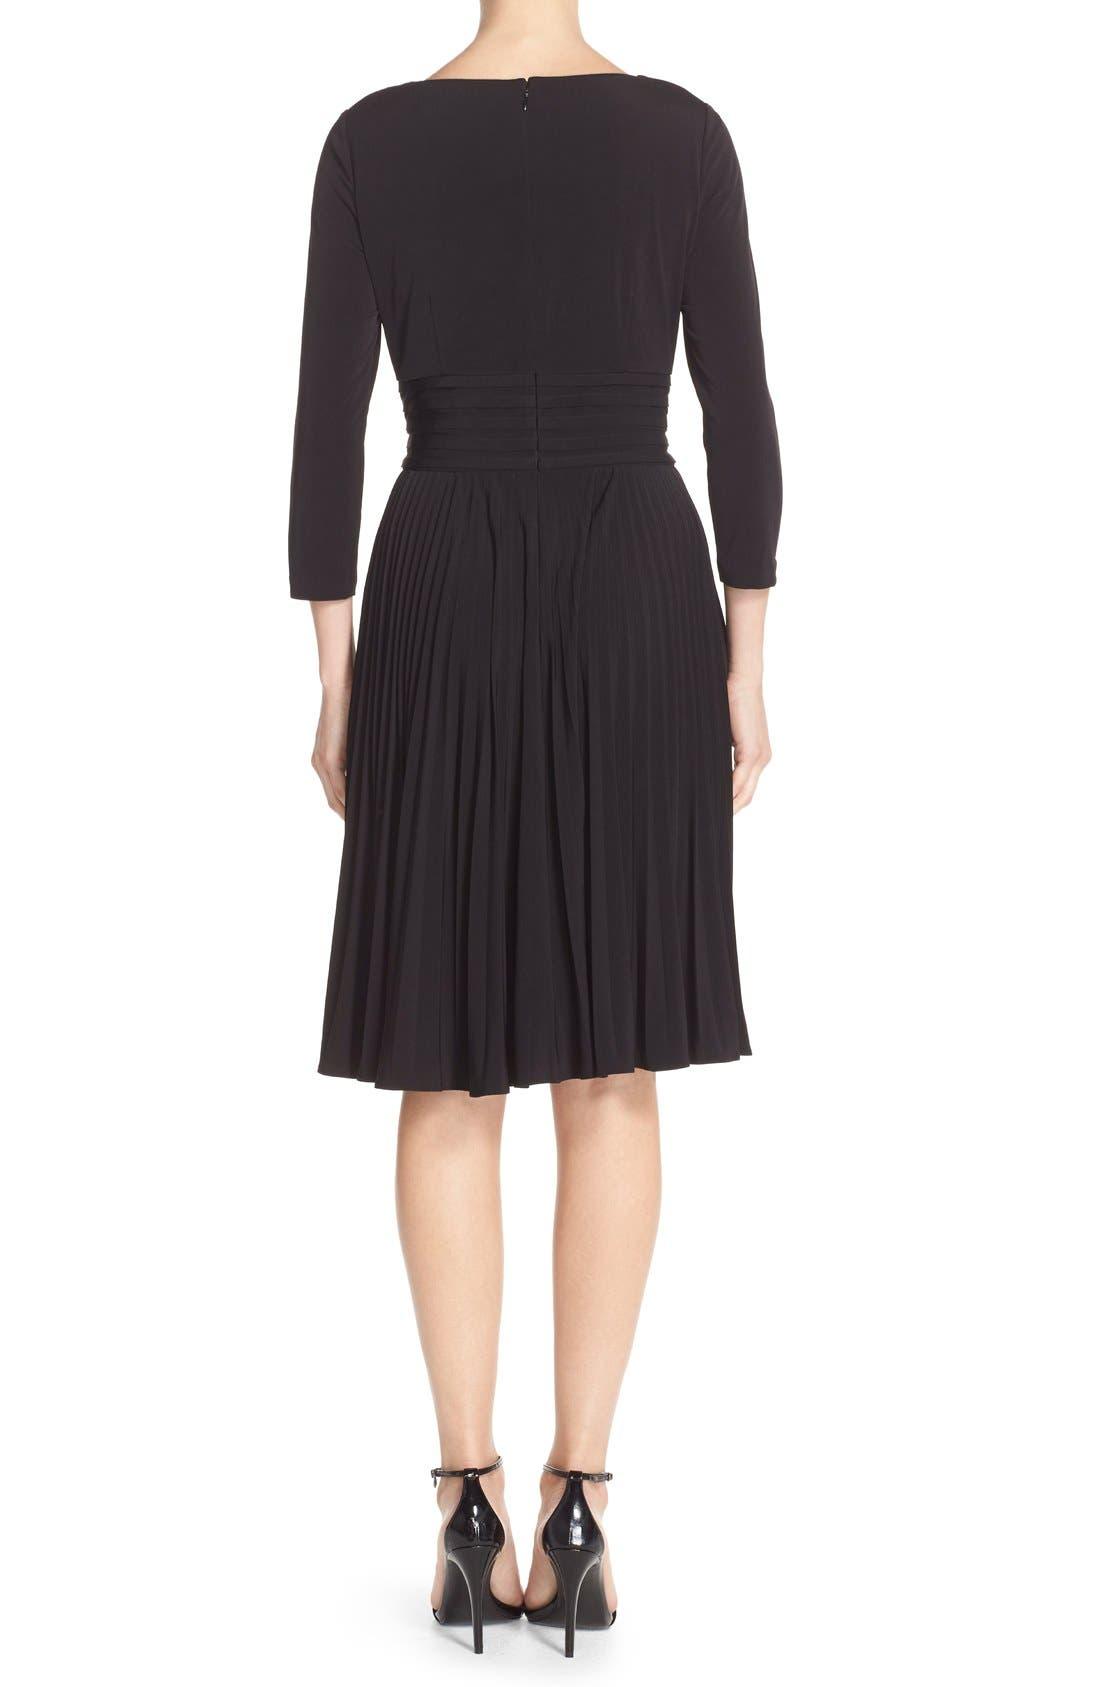 ELIZA J, Pleated Jersey Fit & Flare Dress, Alternate thumbnail 2, color, 001